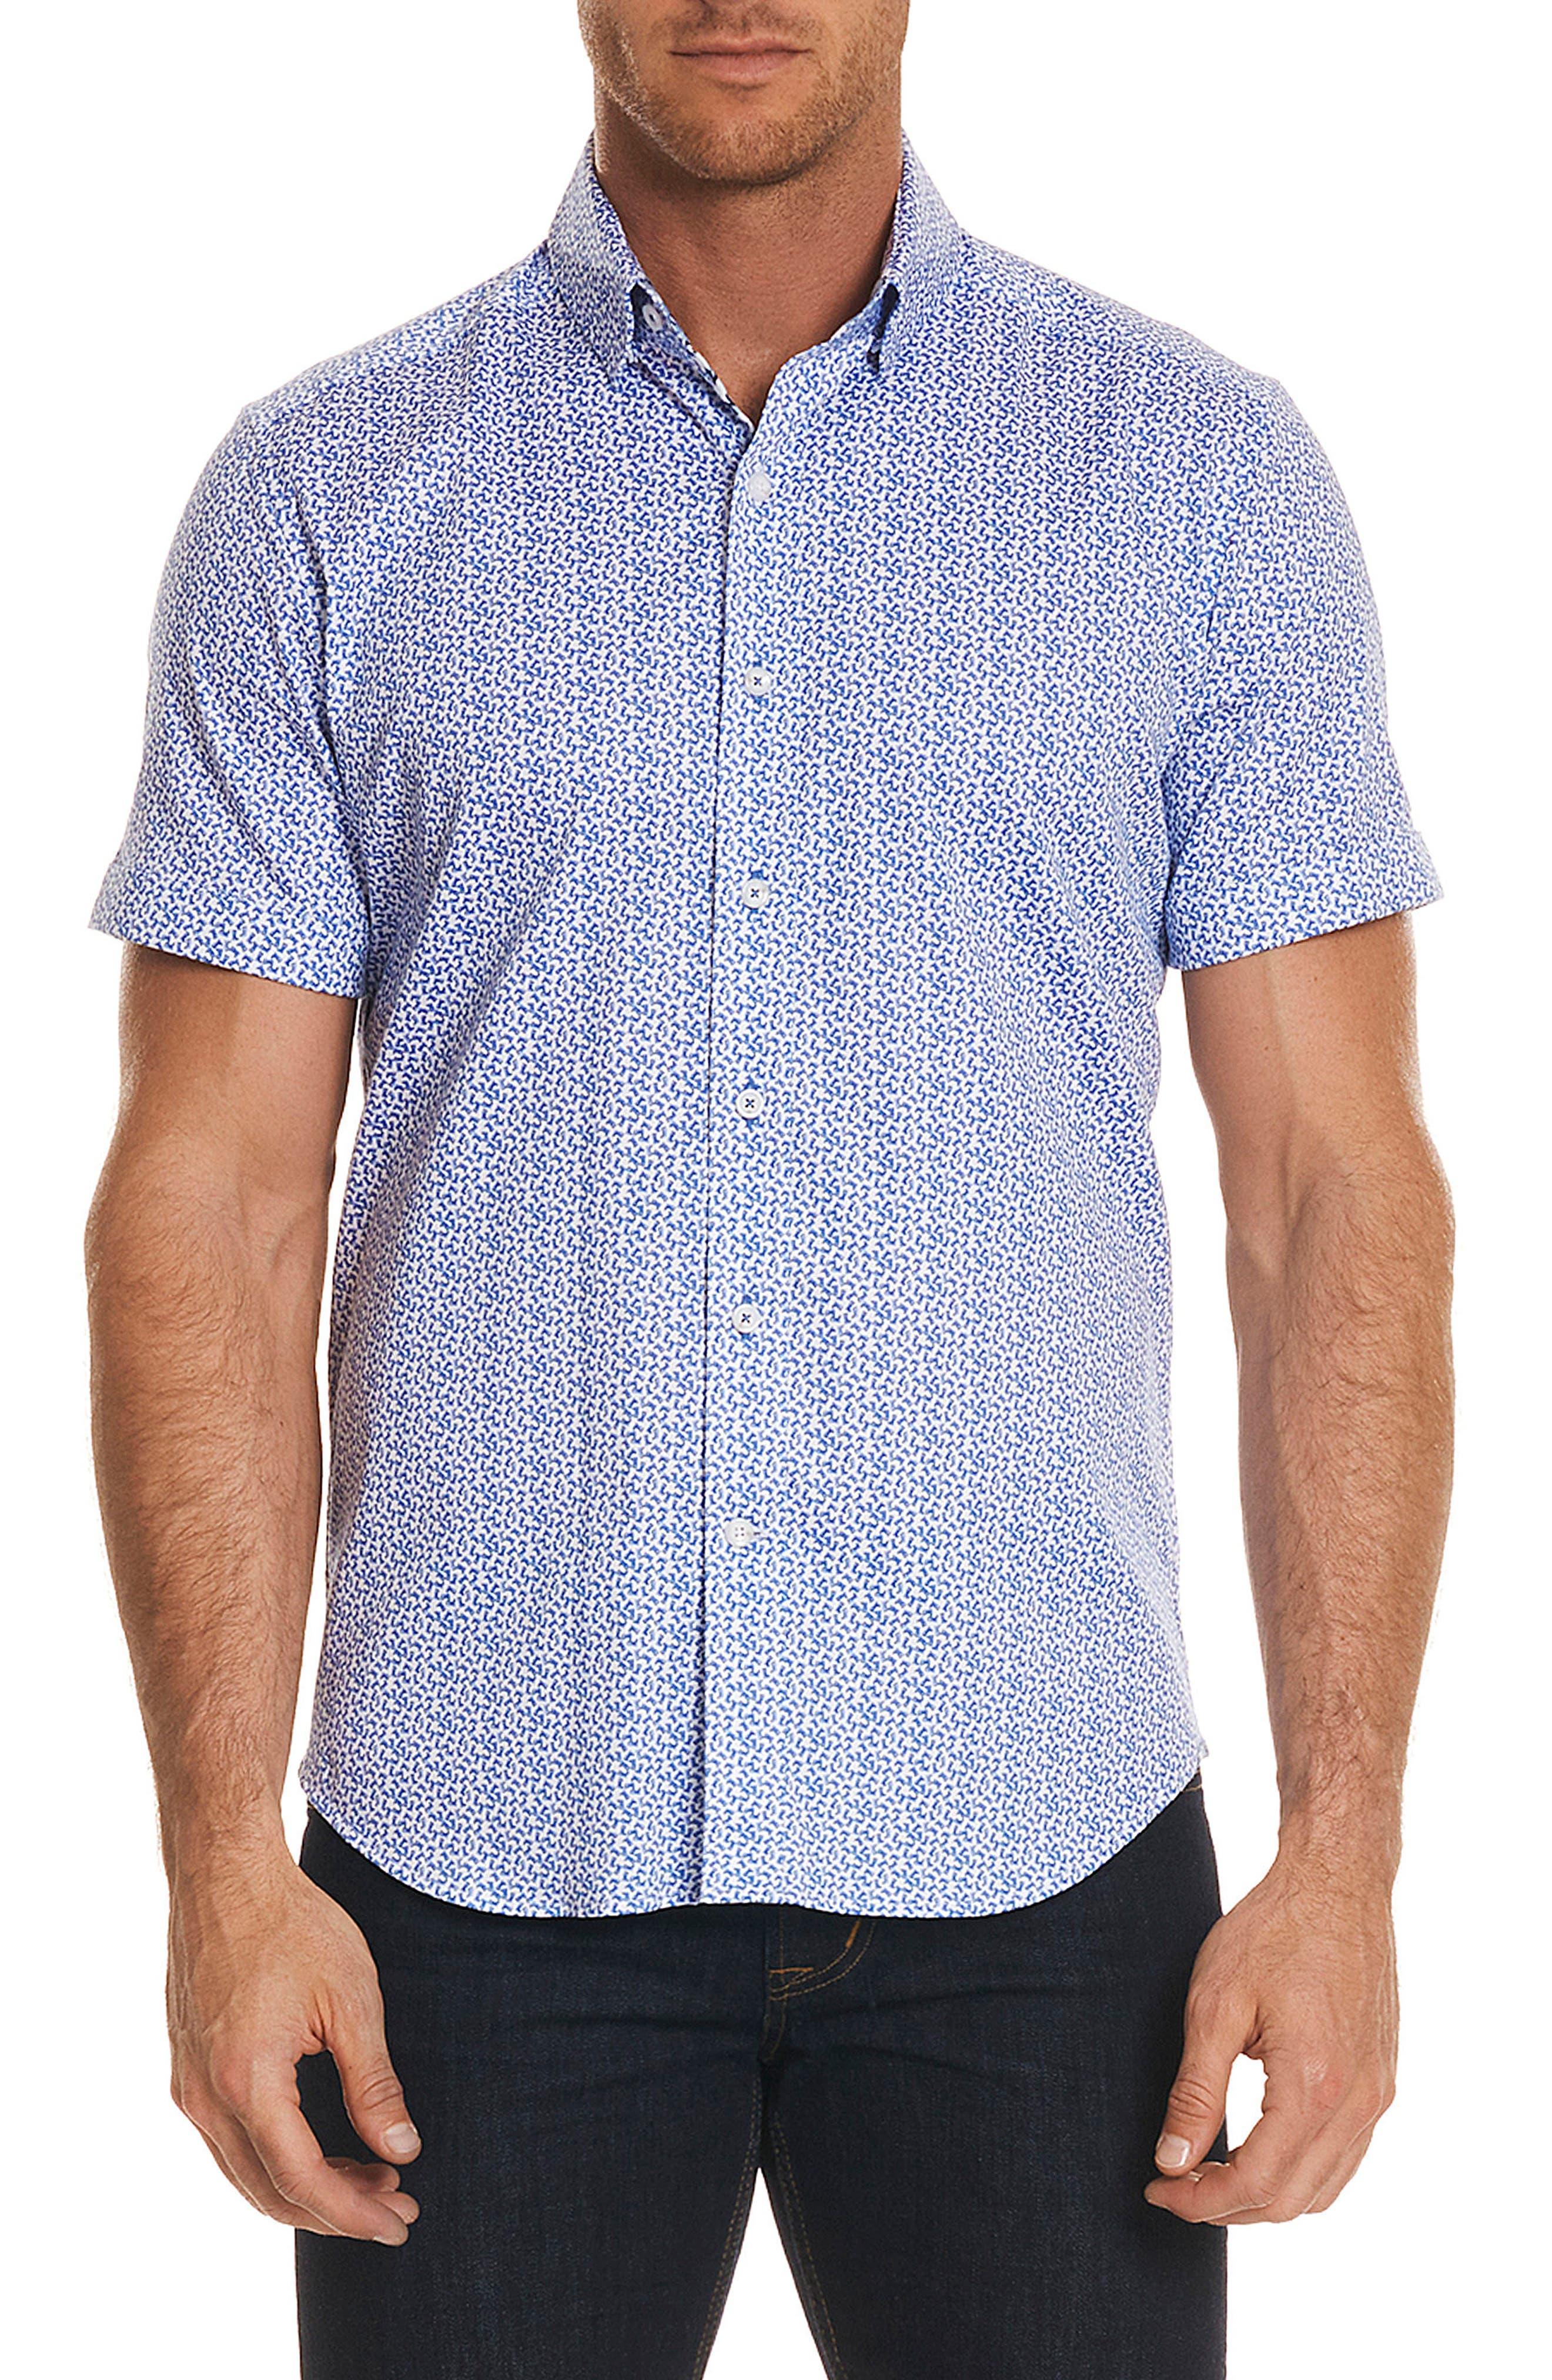 Hartman Tailored Fit Sport Shirt,                             Main thumbnail 1, color,                             Blue